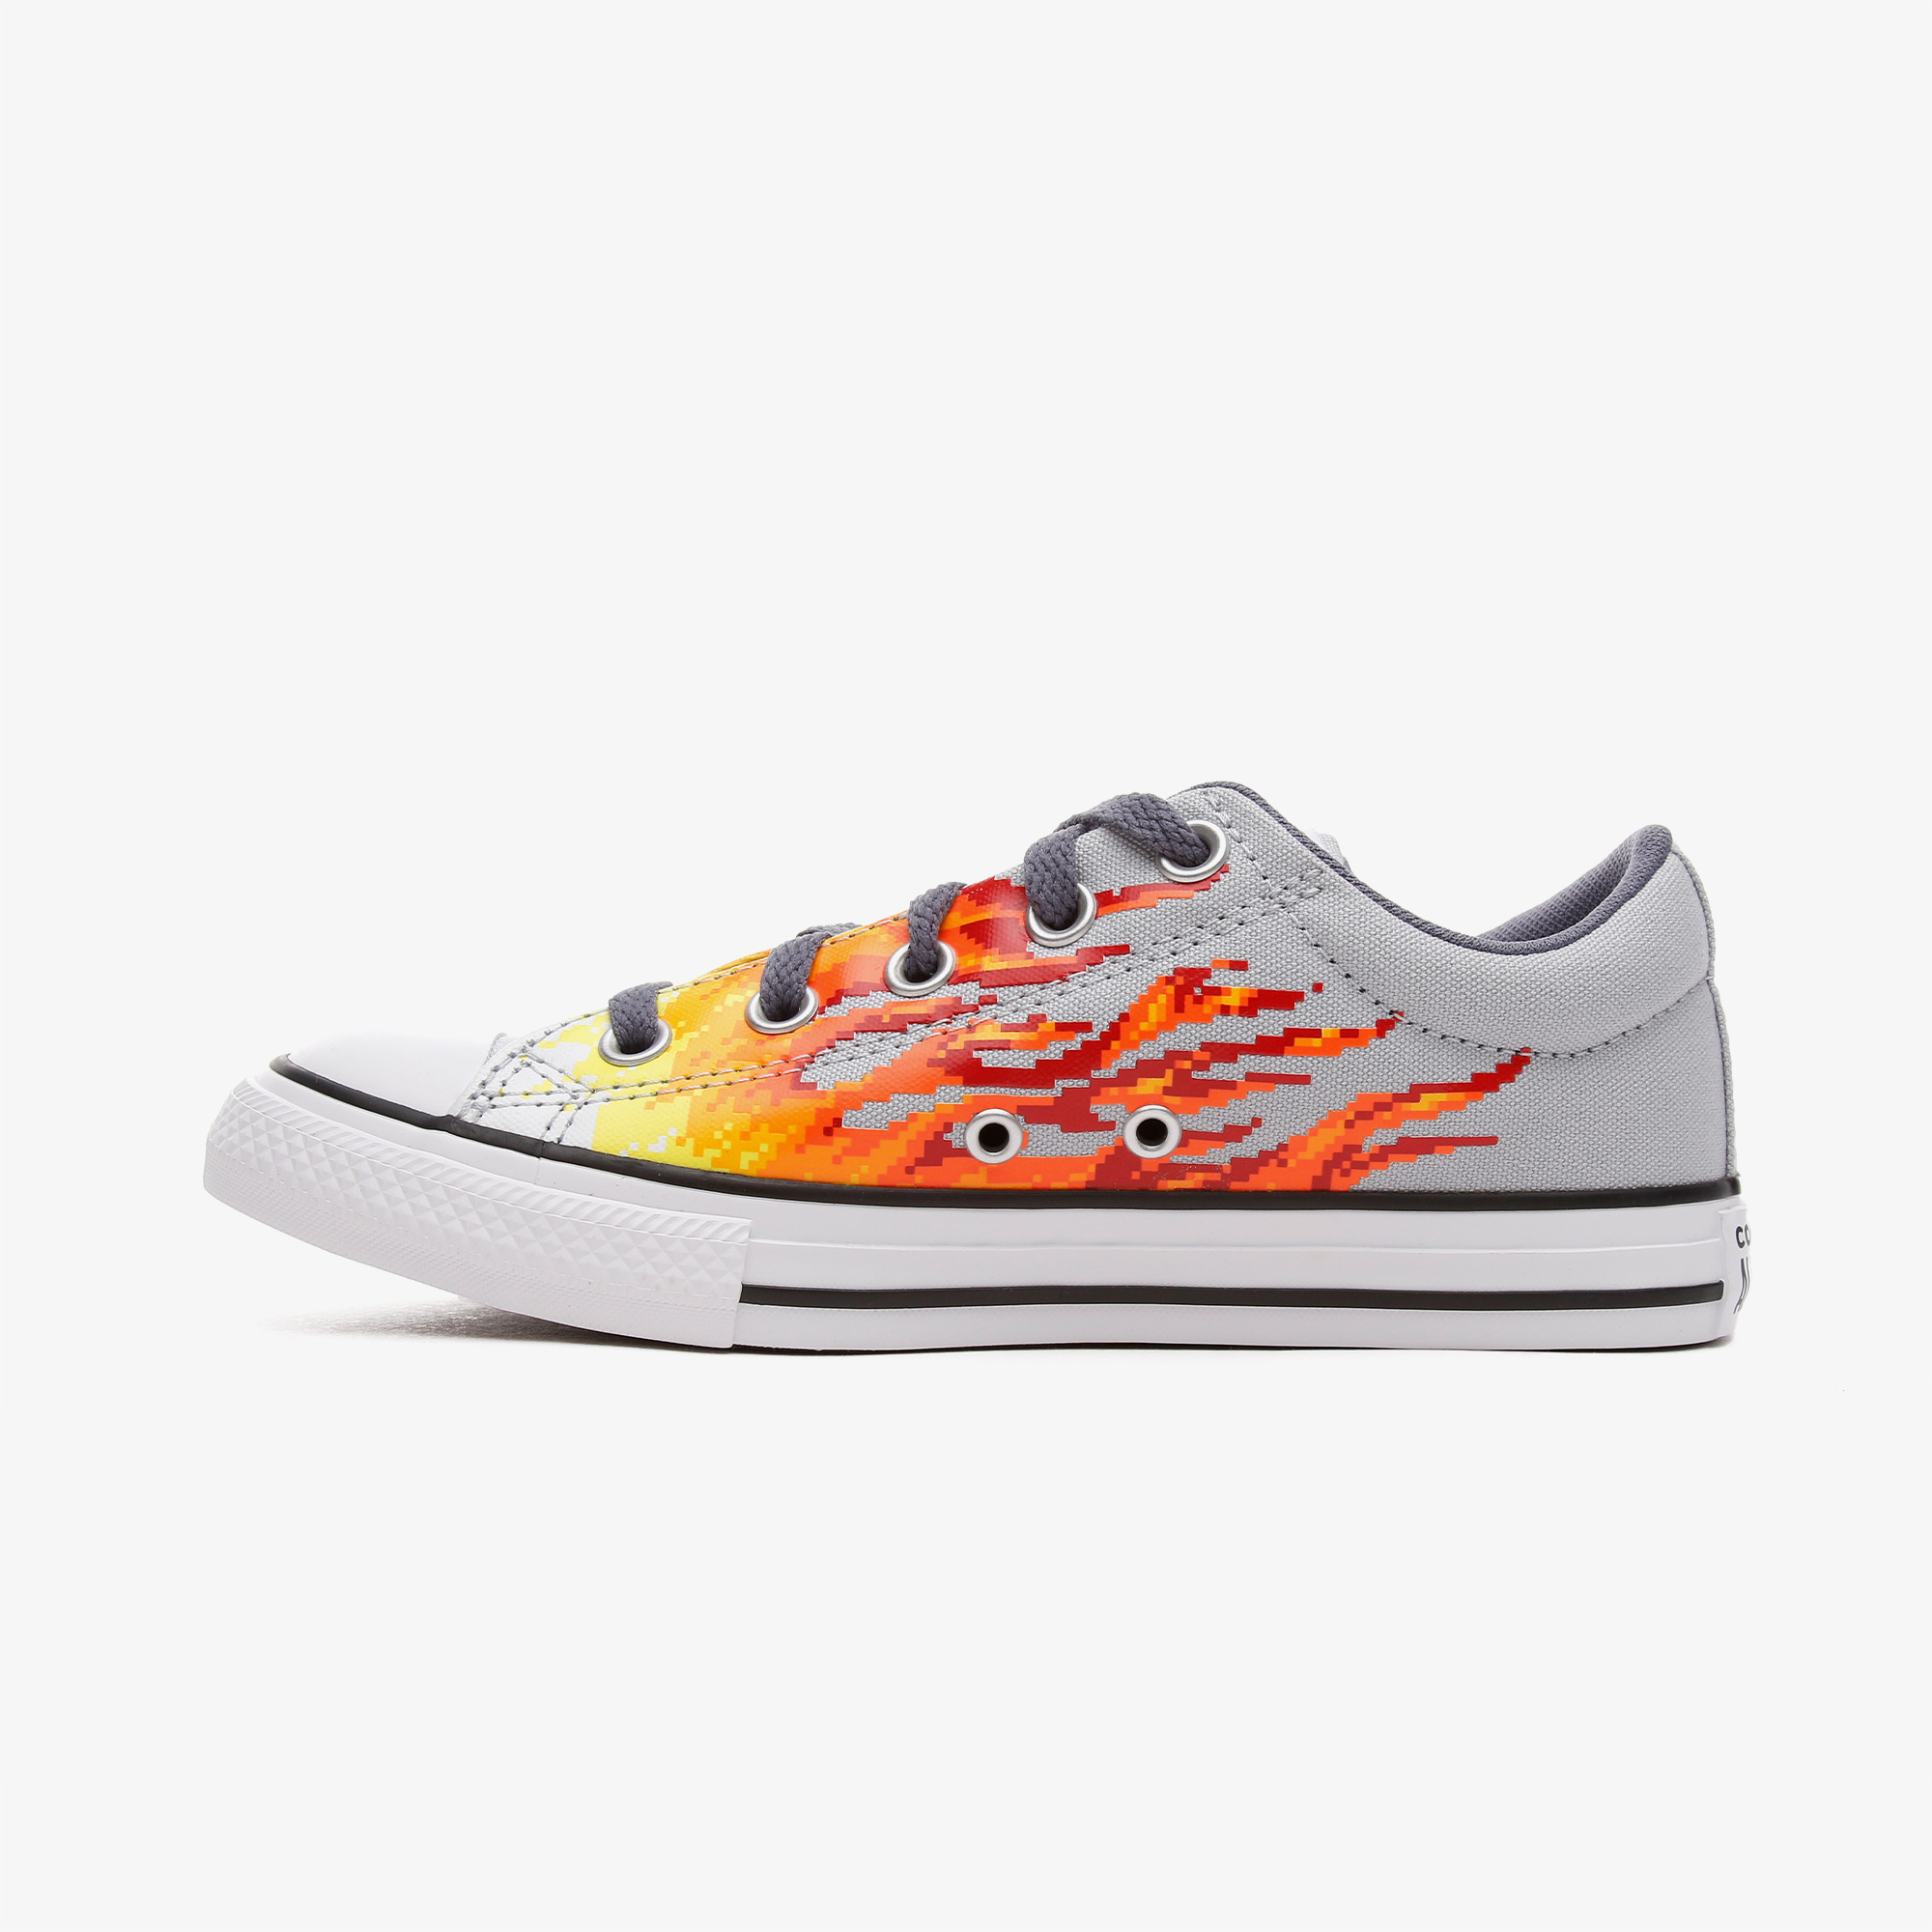 Converse Chuck Taylor All Star Street Çocuk Gri Sneaker